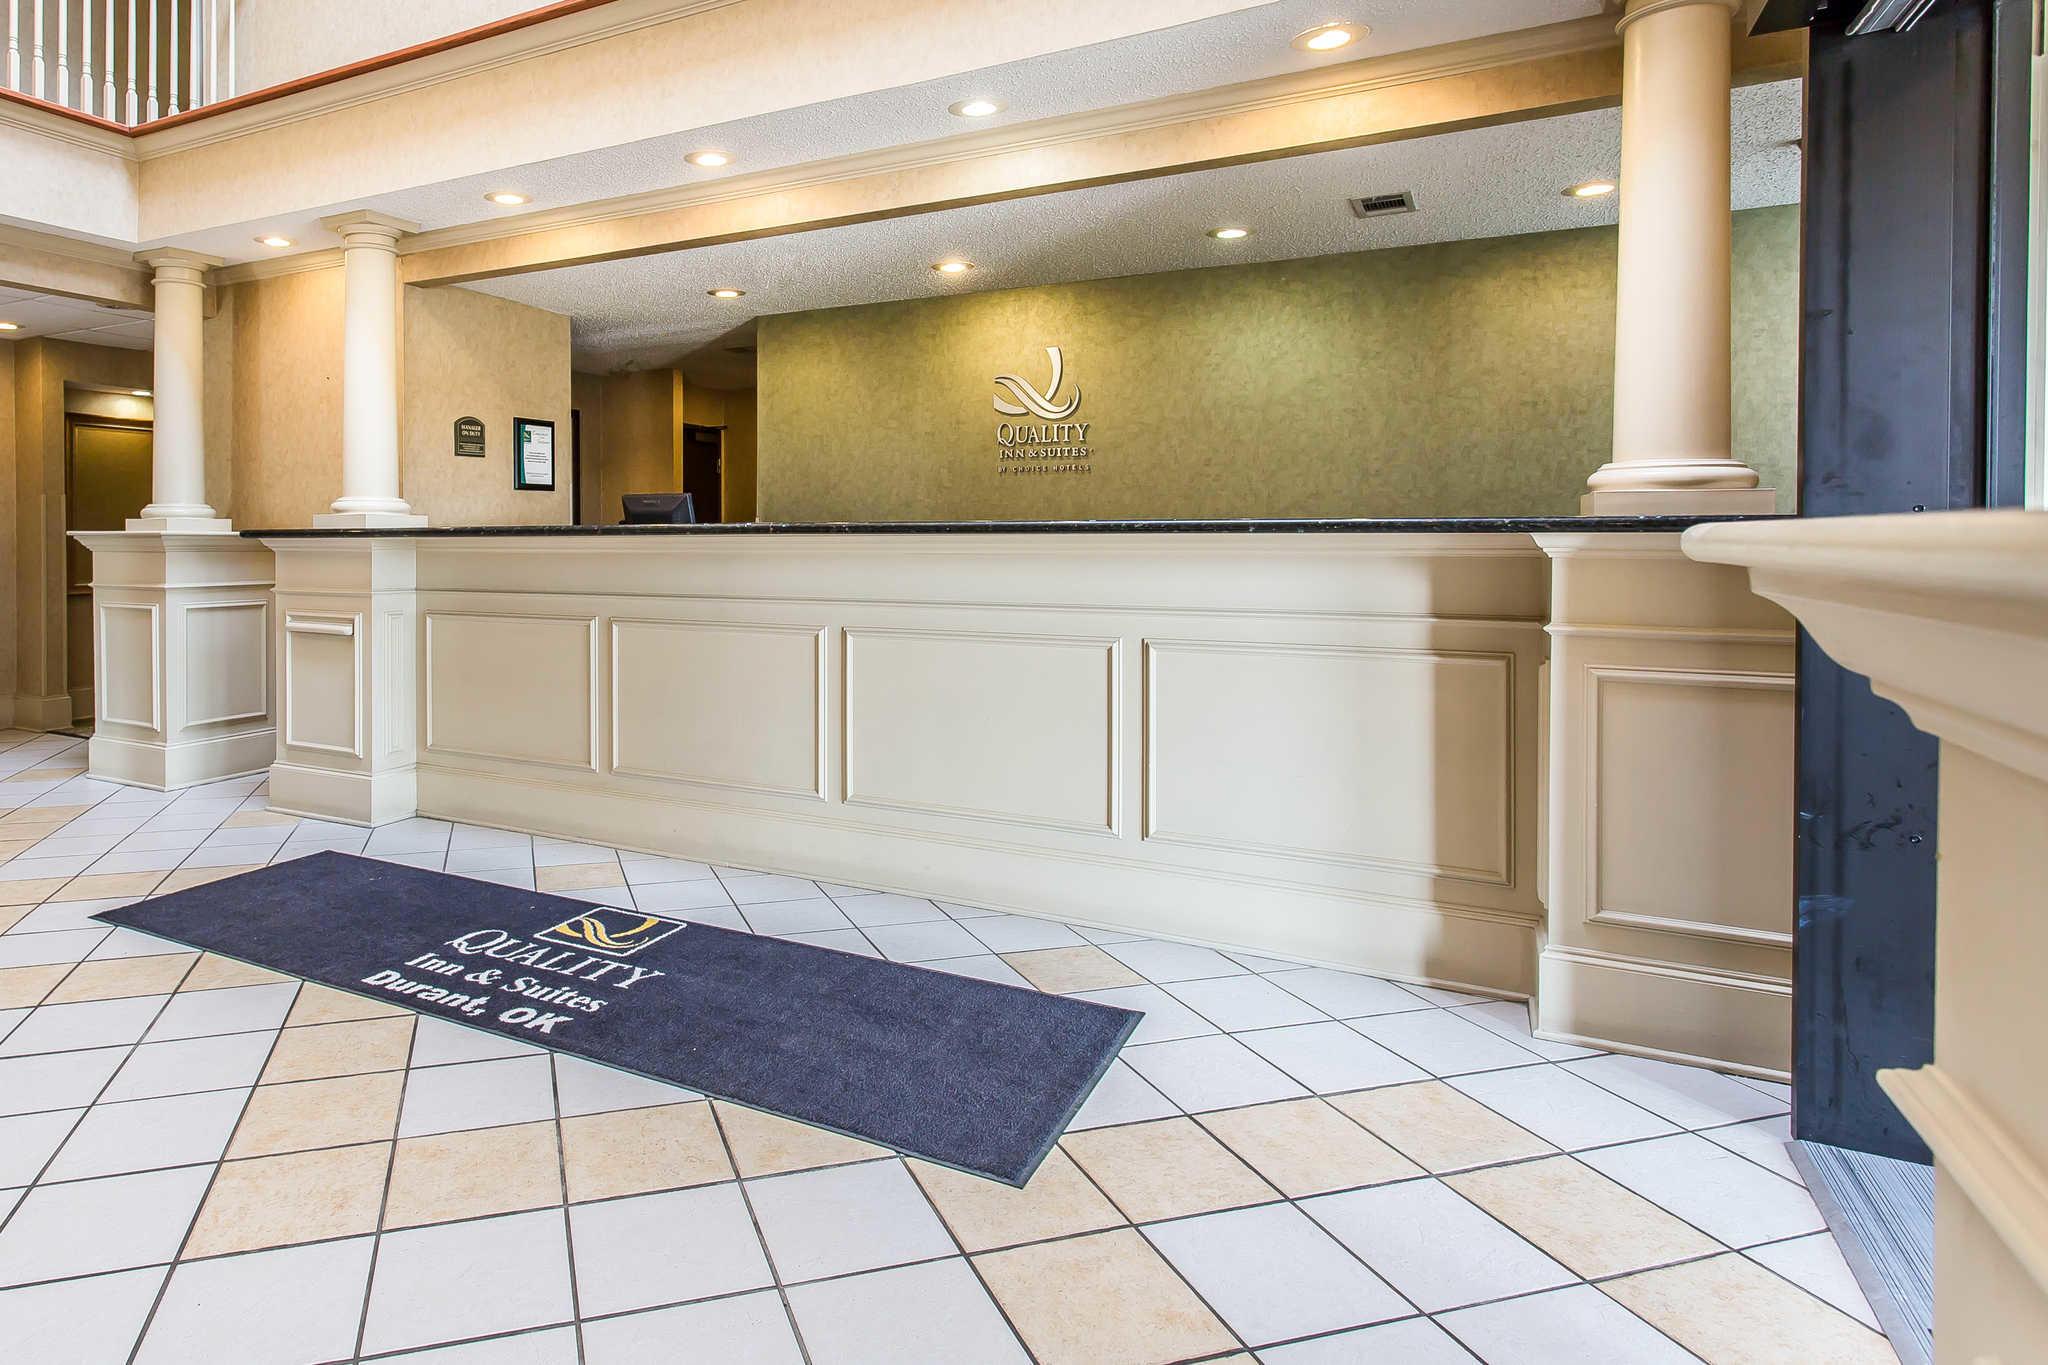 Quality Inn & Suites Durant image 5